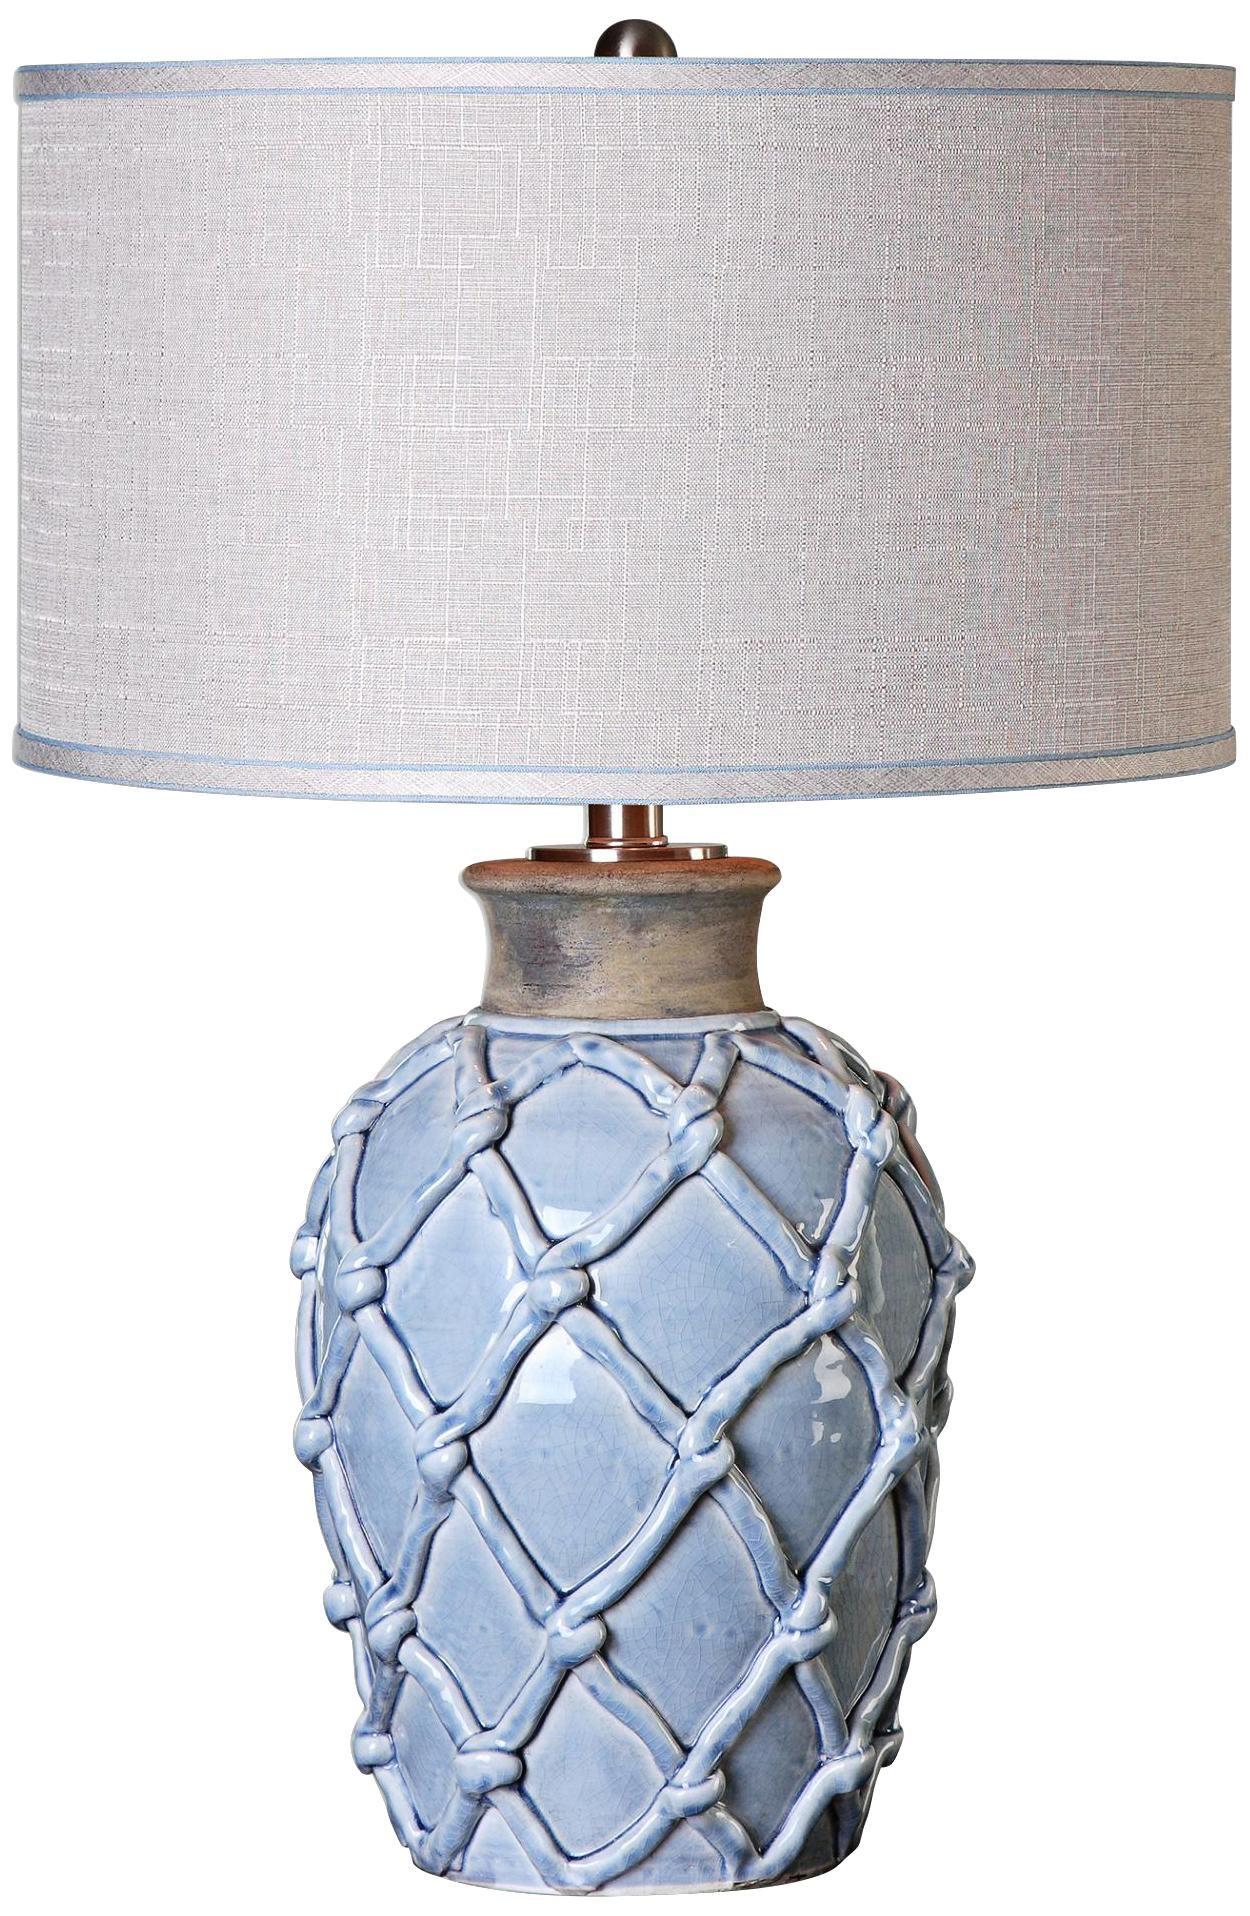 Blue ceramic table lamps - Uttermost Parterre Hammock Pale Blue Ceramic Table Lamp